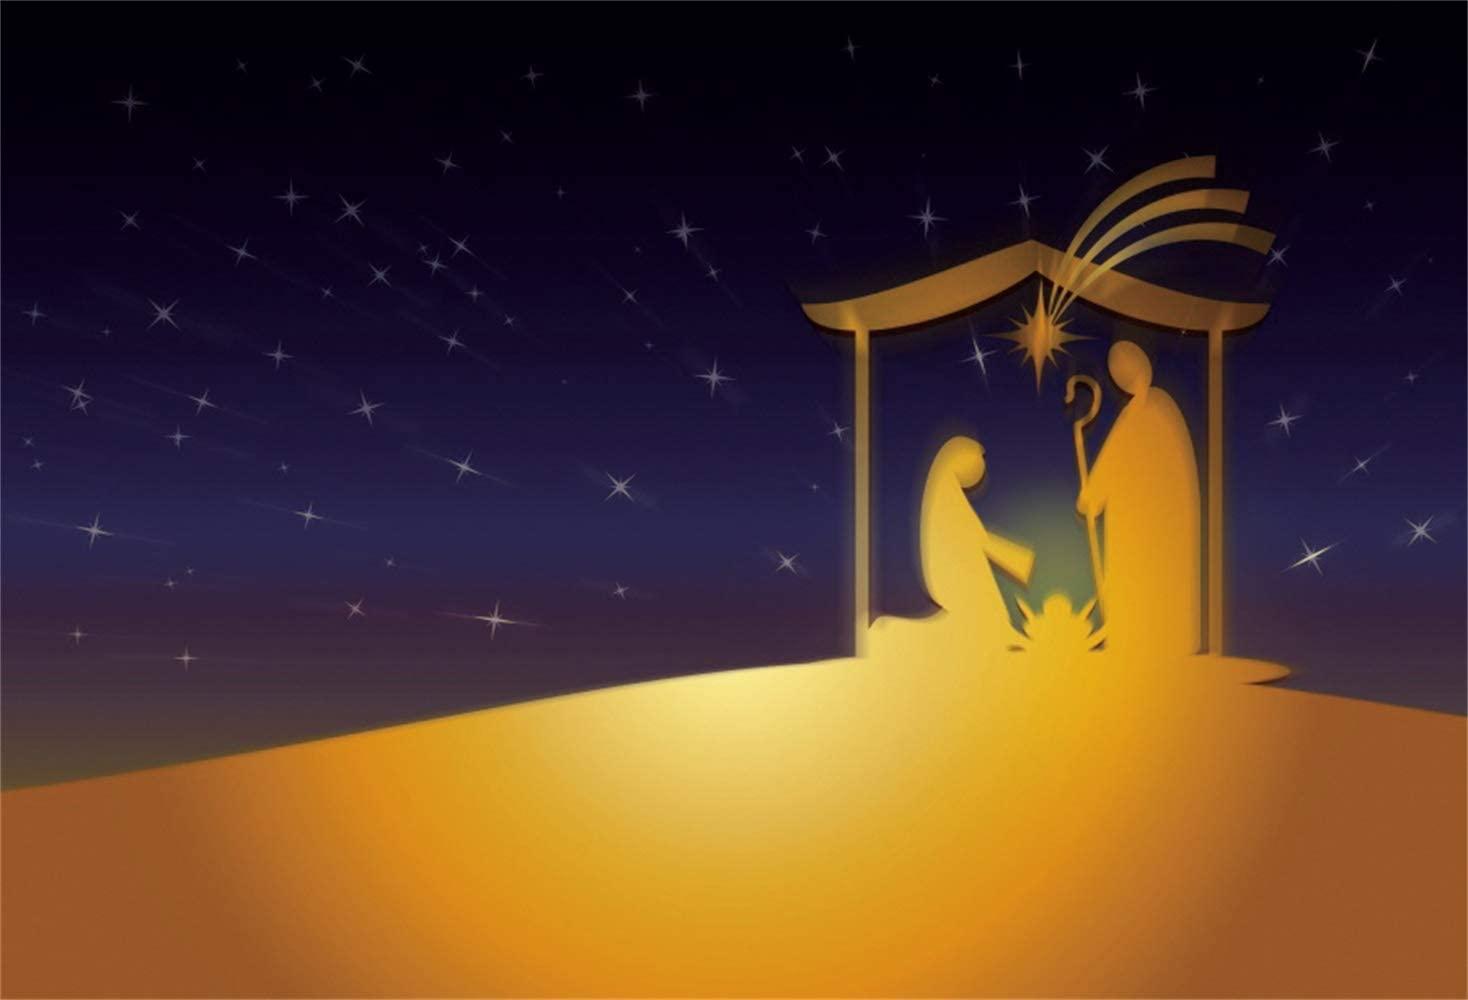 Leowefowa Wilderness Starry Nightsky Nativity Scene Backdrop 5x3ft Birth of Jesus Shabby Manger Shepherd Virgin Mary Silhouette Vinyl Photography Background Bible Story Wallpaper Photo Props